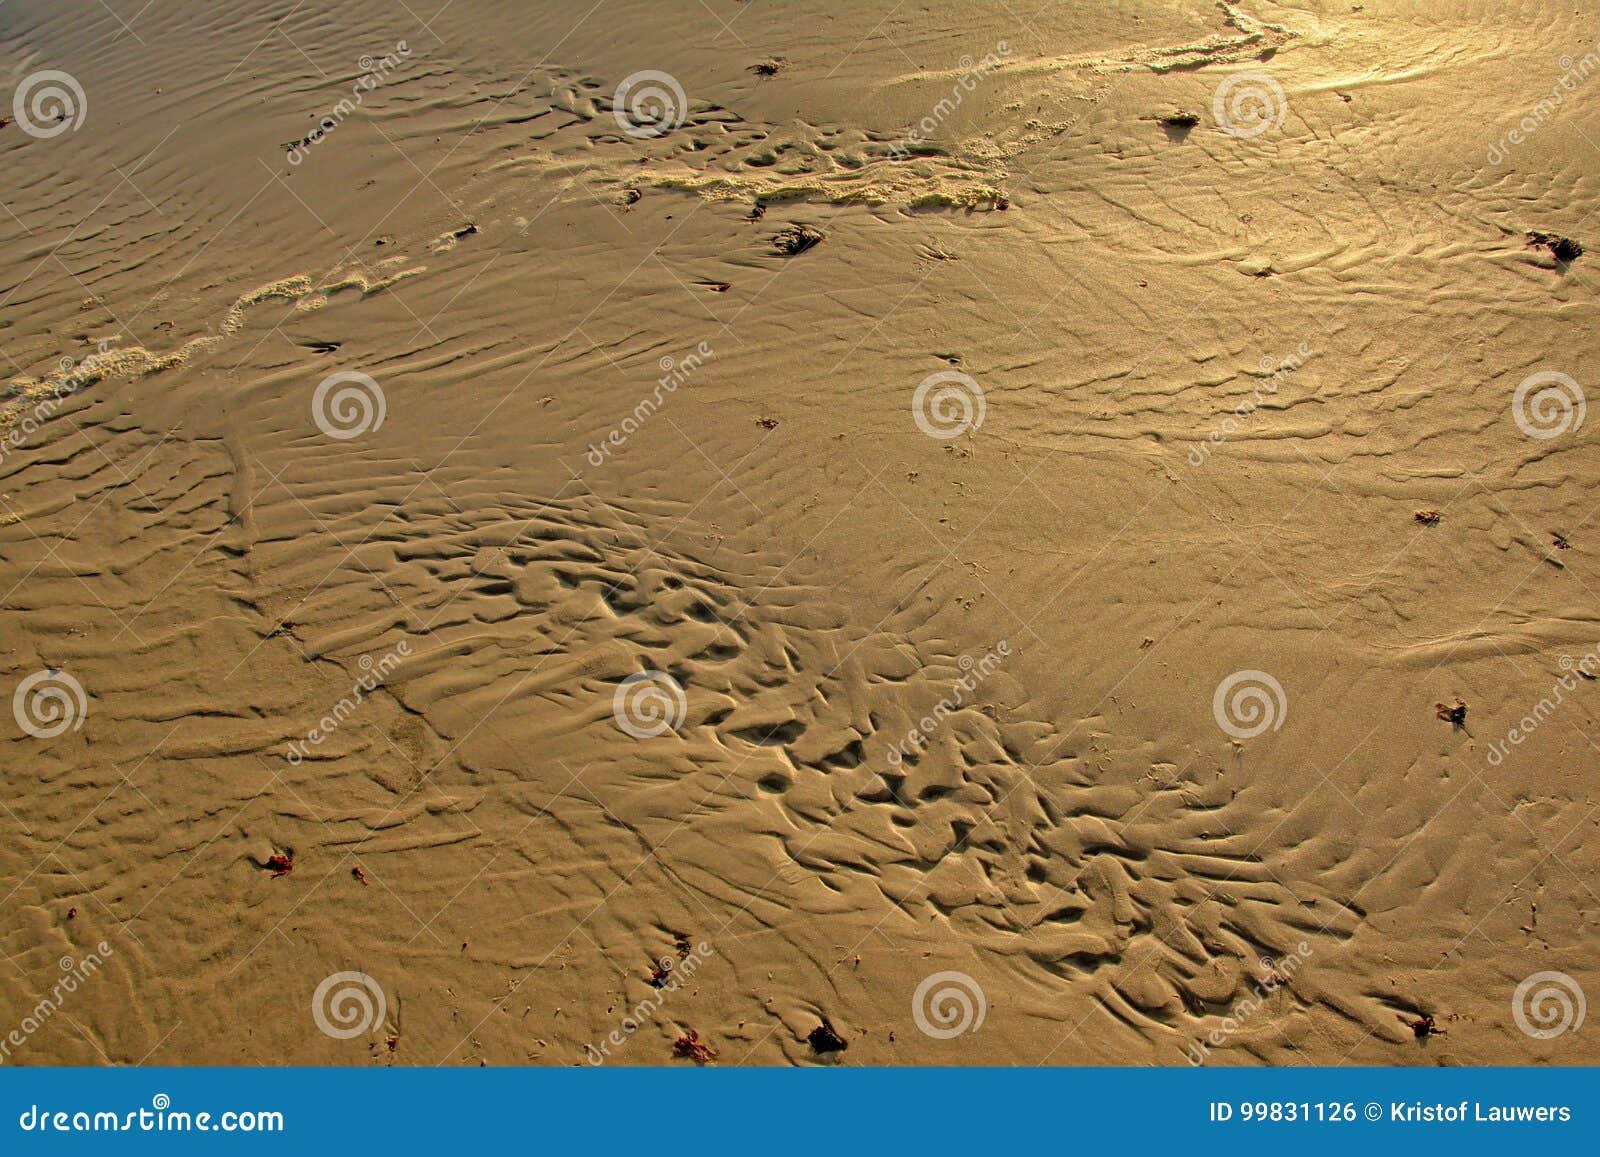 Testes padrões ondulados da areia na areia molhada na praia